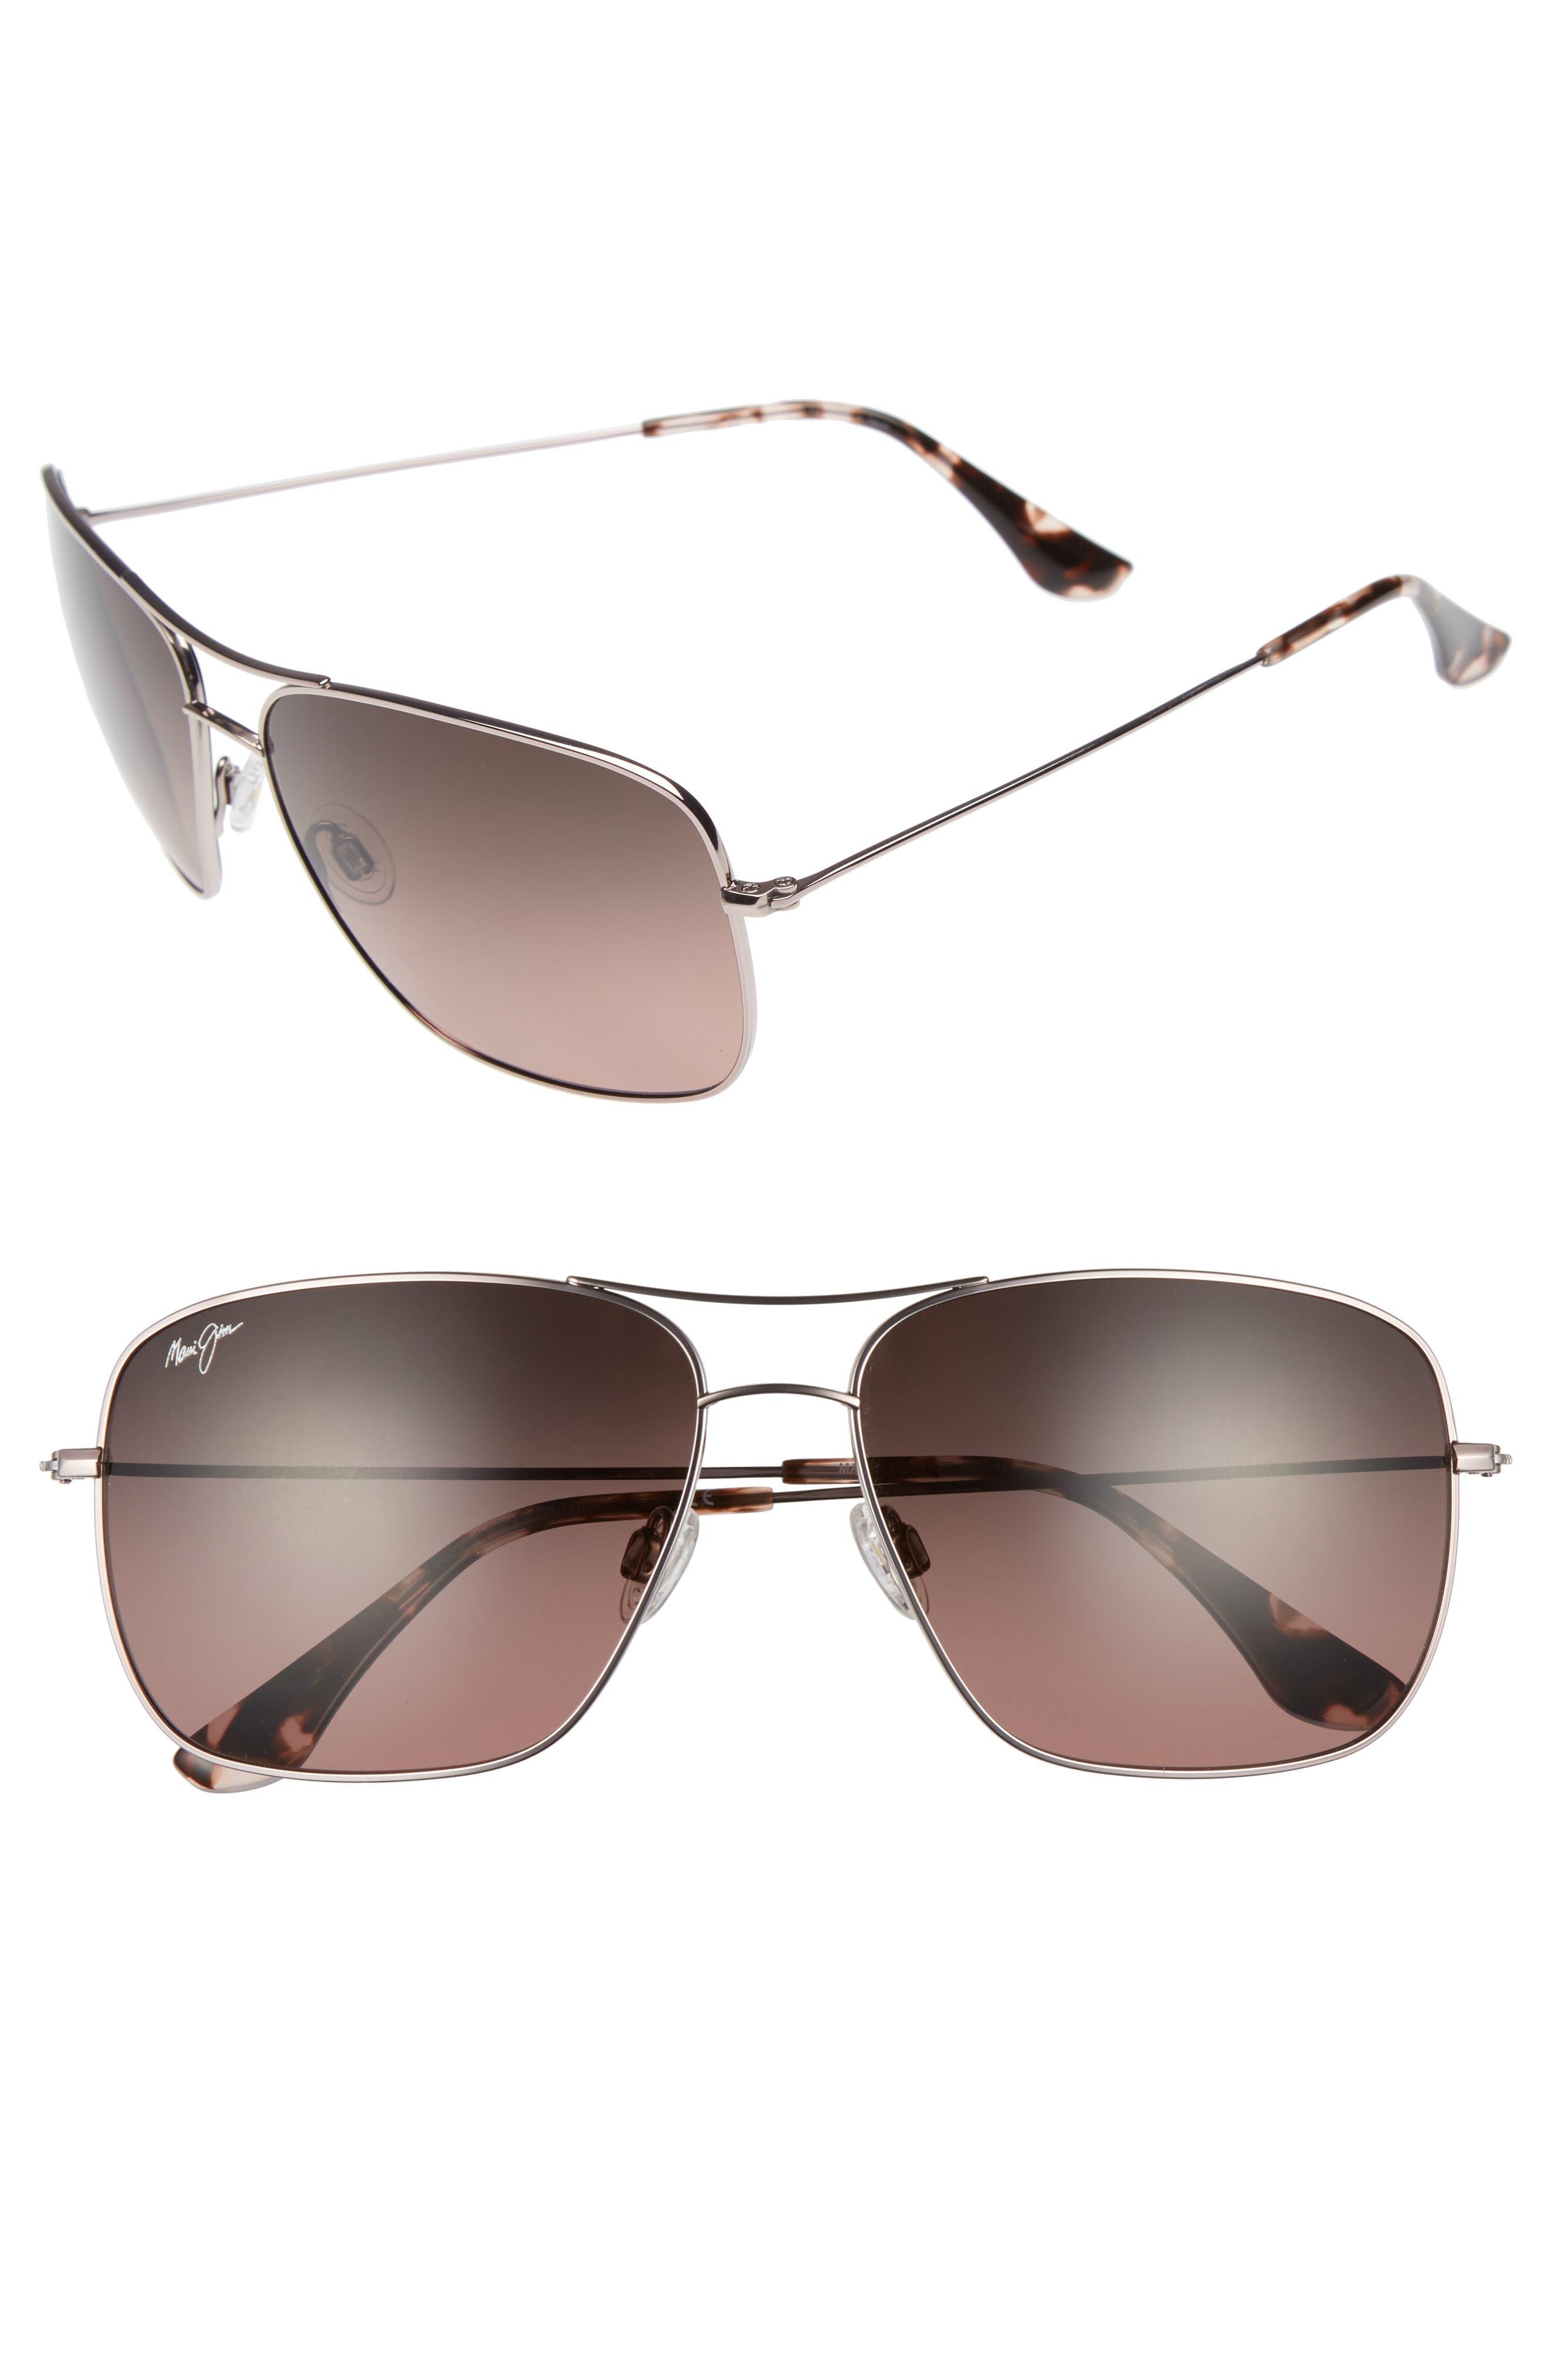 Cook Pines 63mm Polarized Titanium Aviator Sunglasses,                             Main thumbnail 3, color,